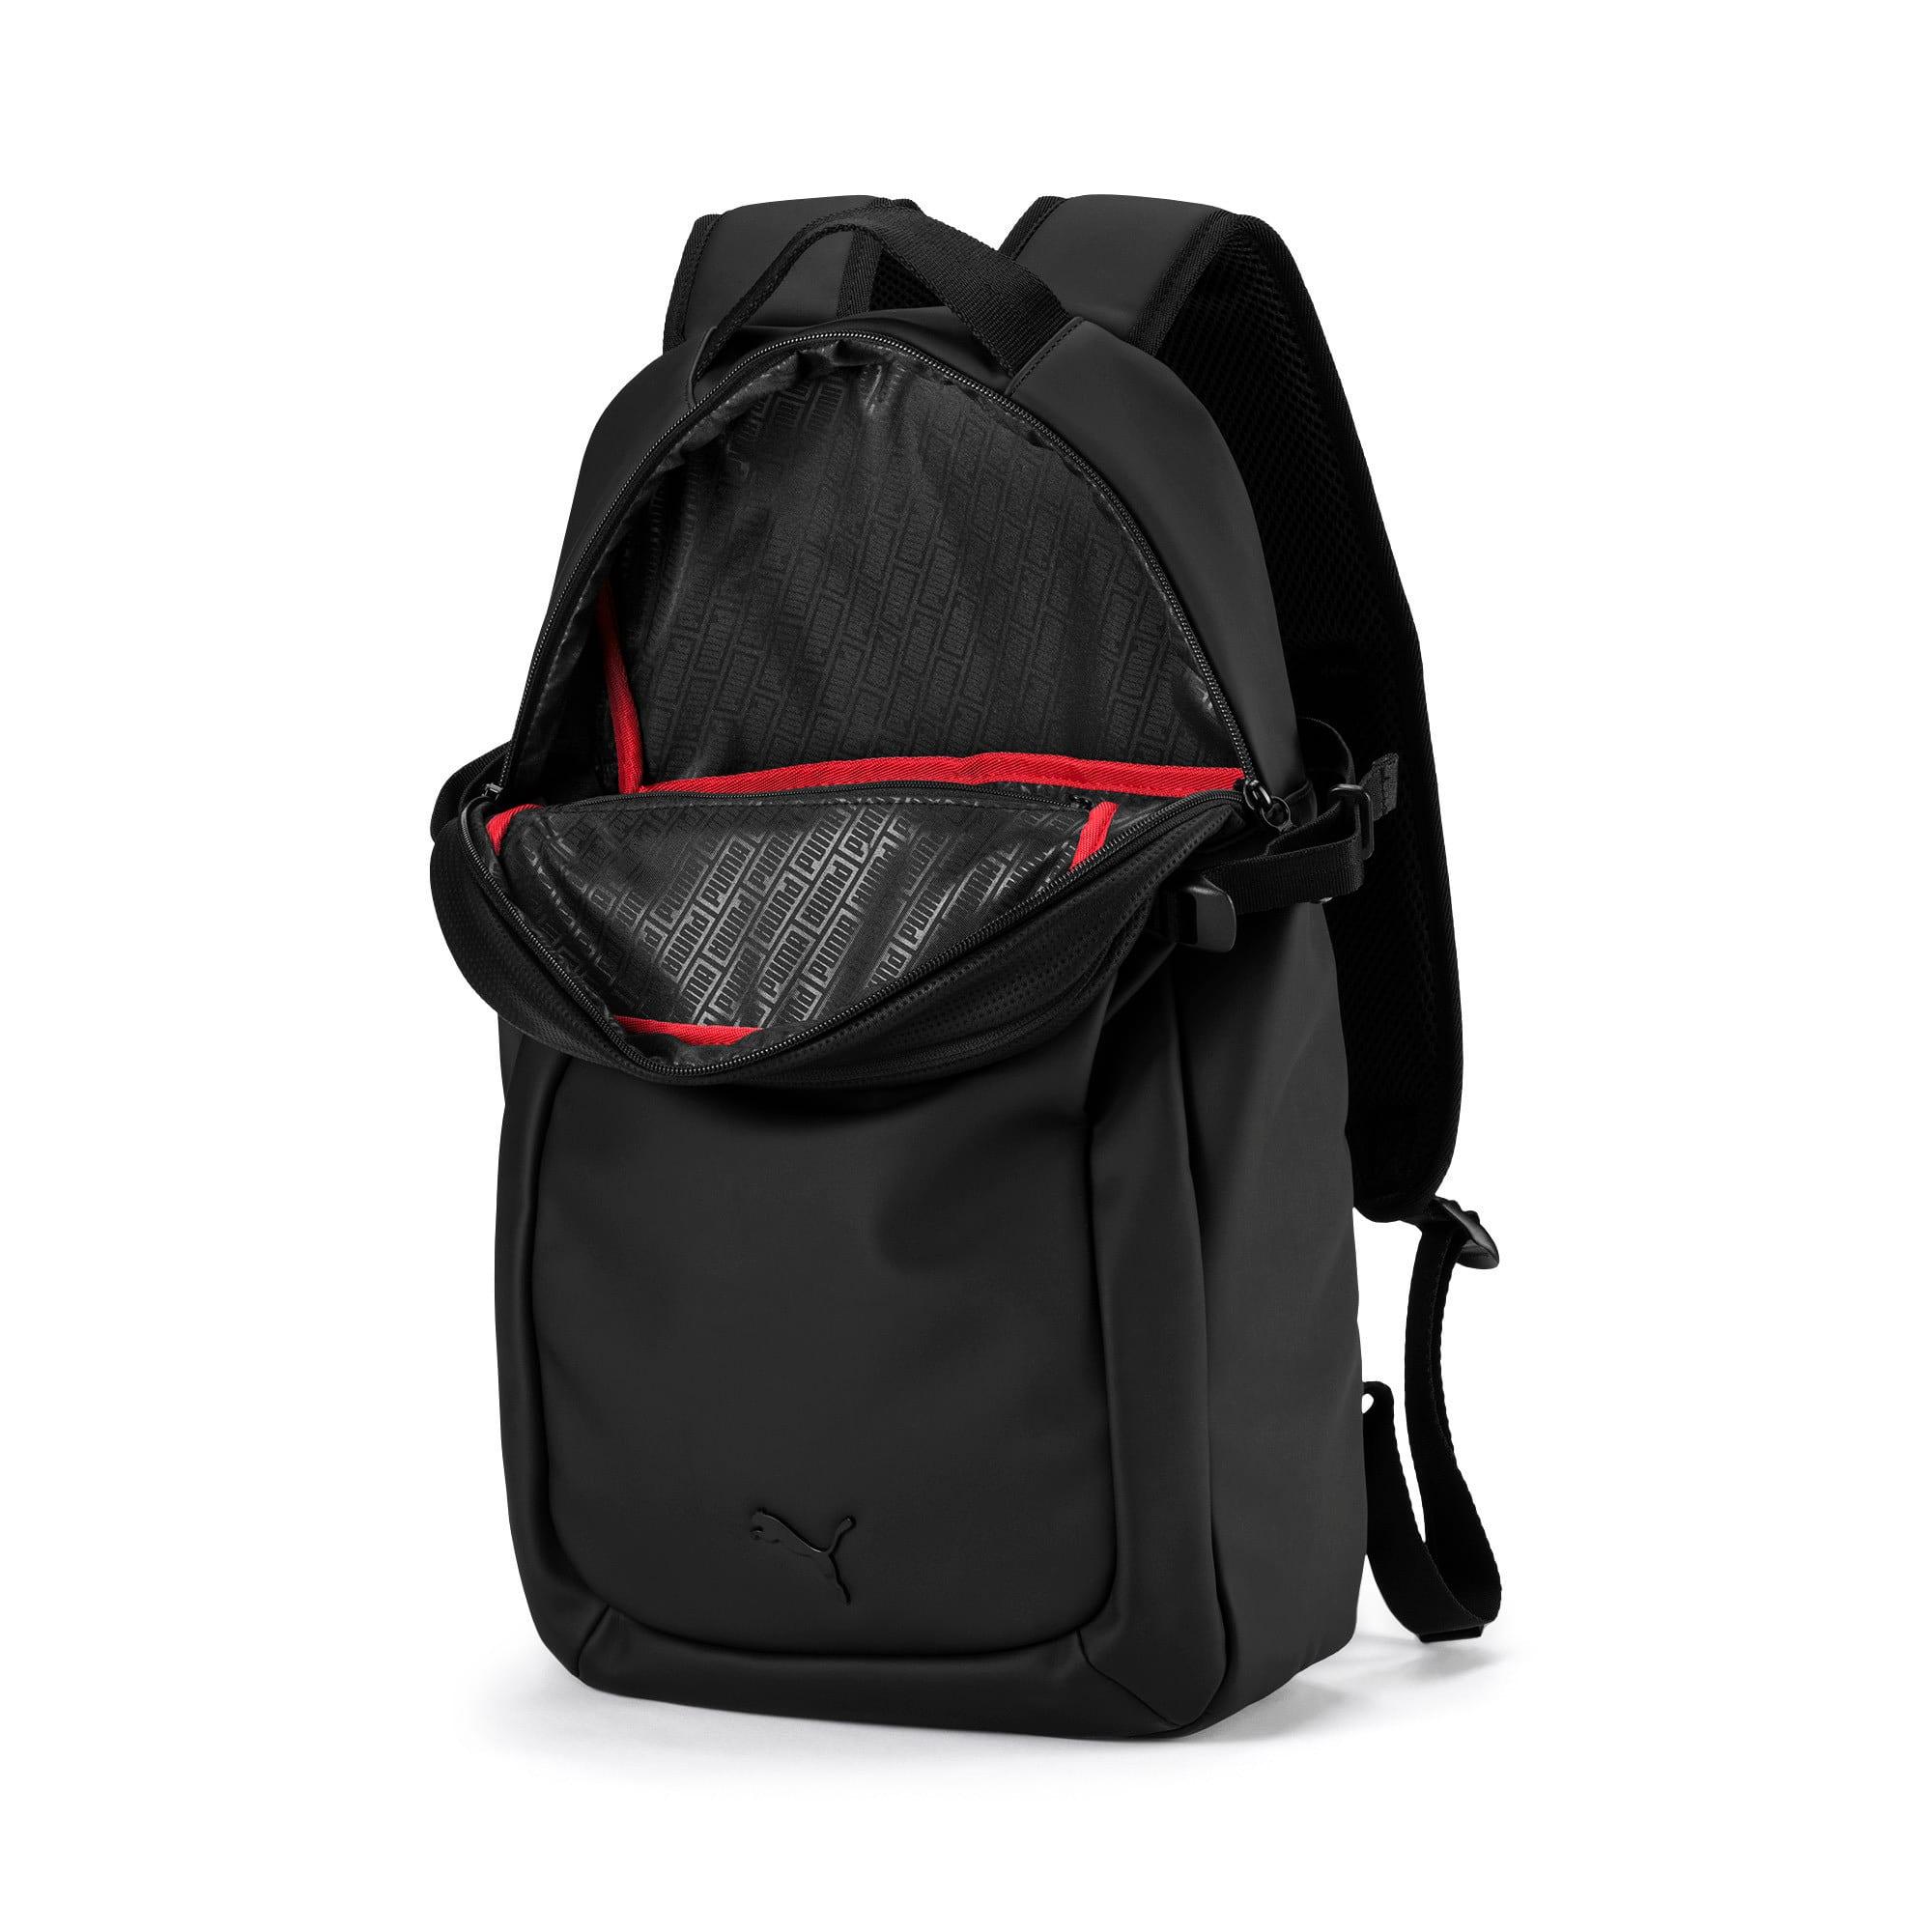 Thumbnail 4 of Ferrari Lifestyle Backpack, Puma Black, medium